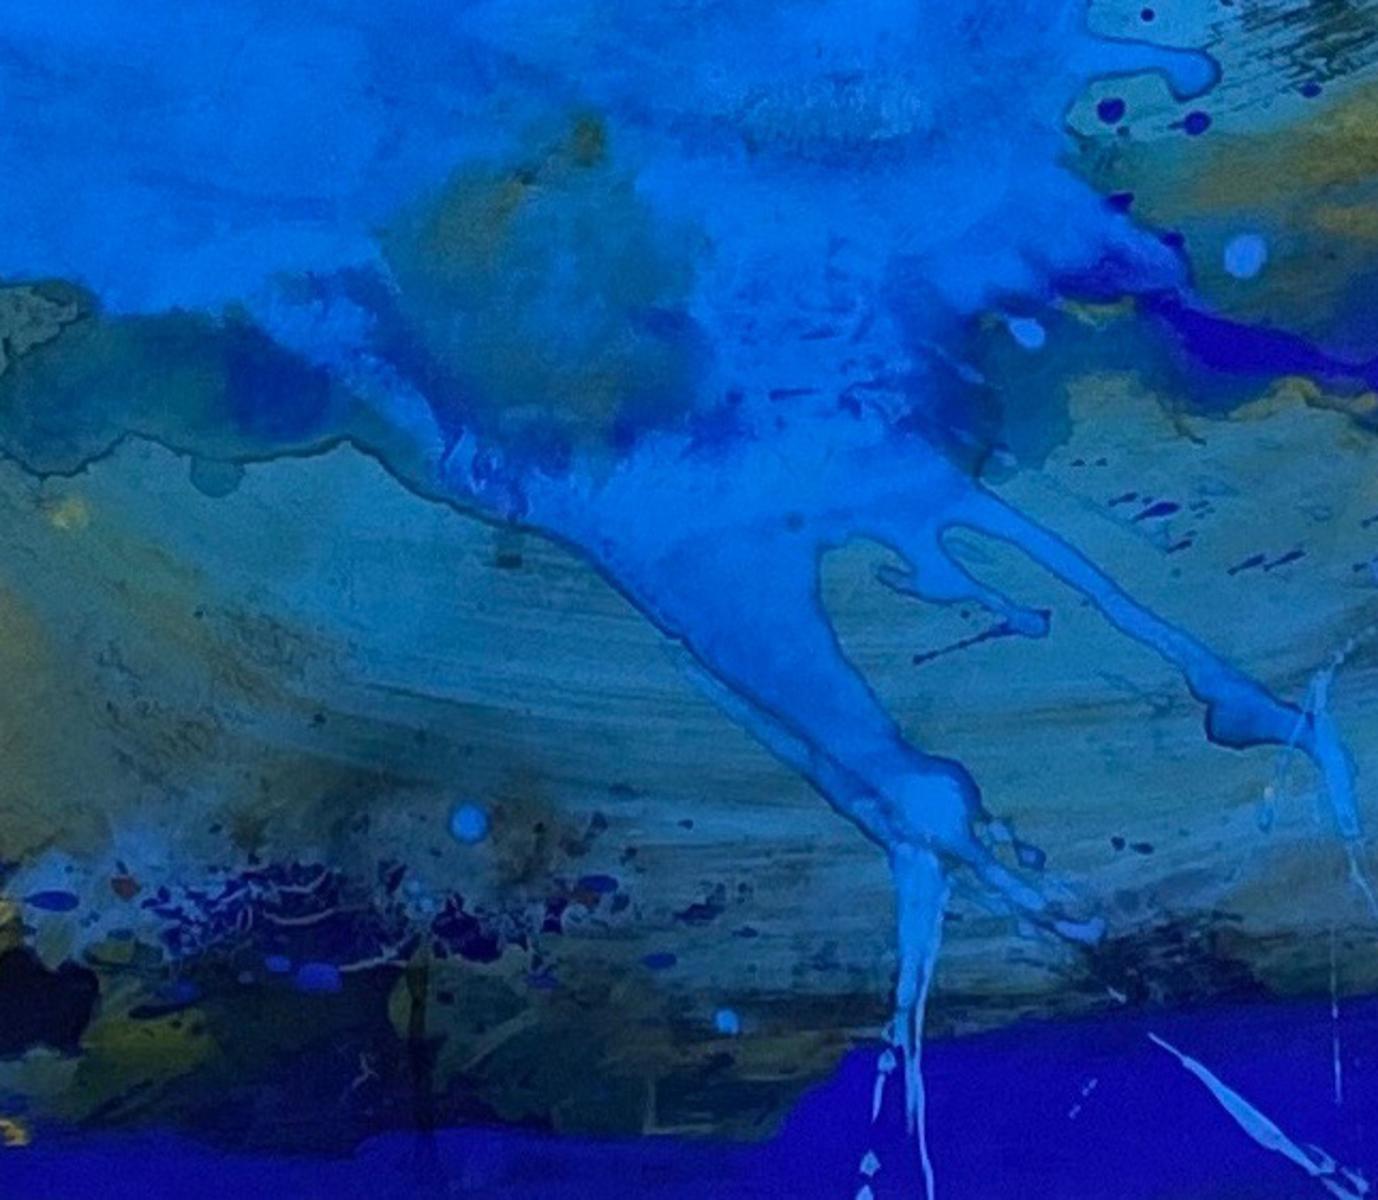 Arabella Caccia - Ocean Chaff 2